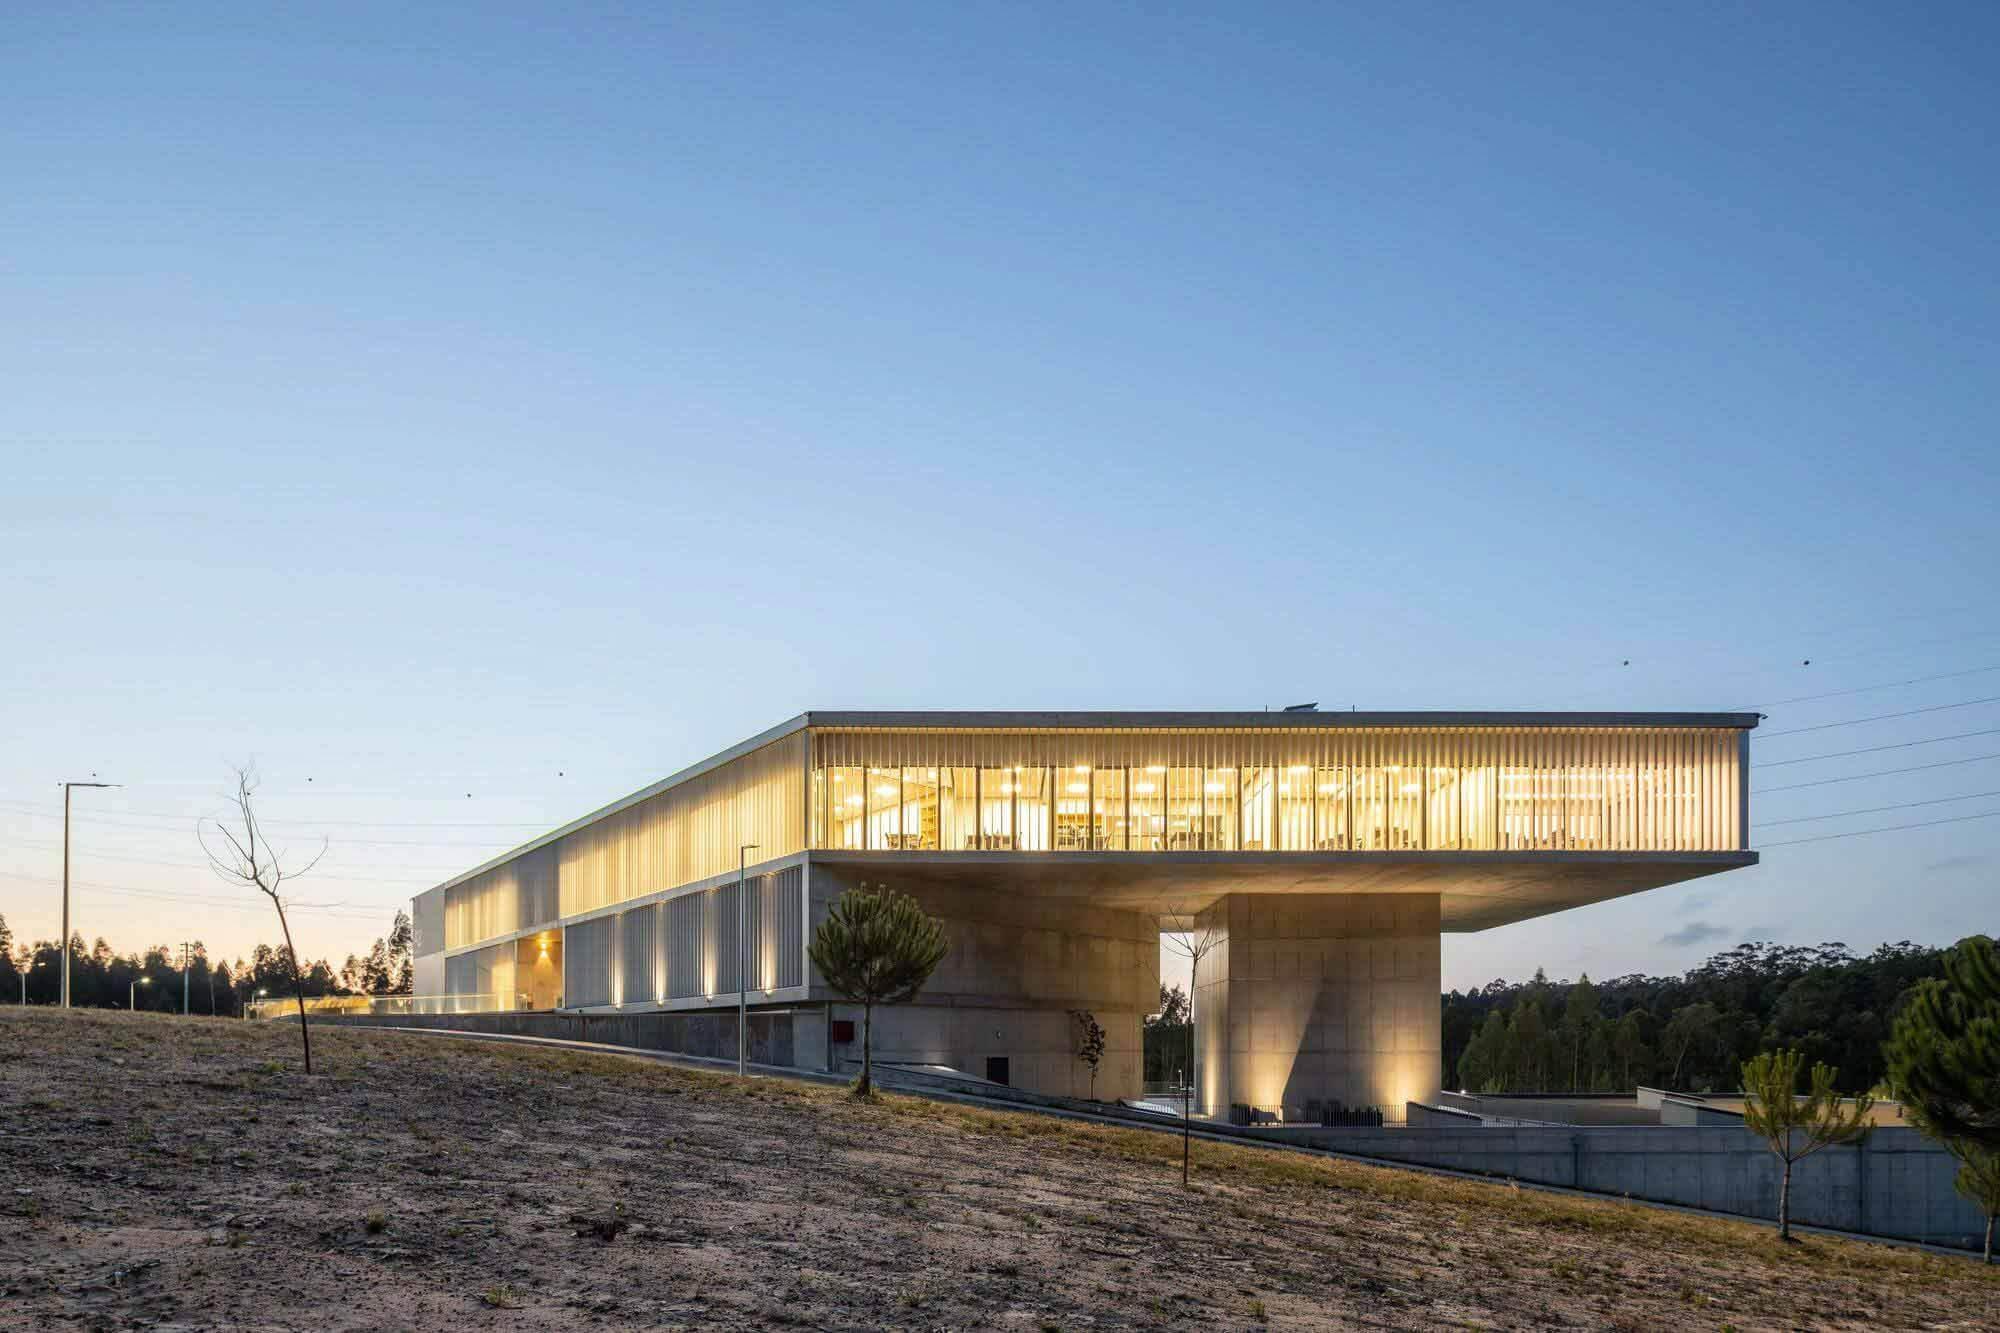 Бизнес-центр AOC / mube arquitectura